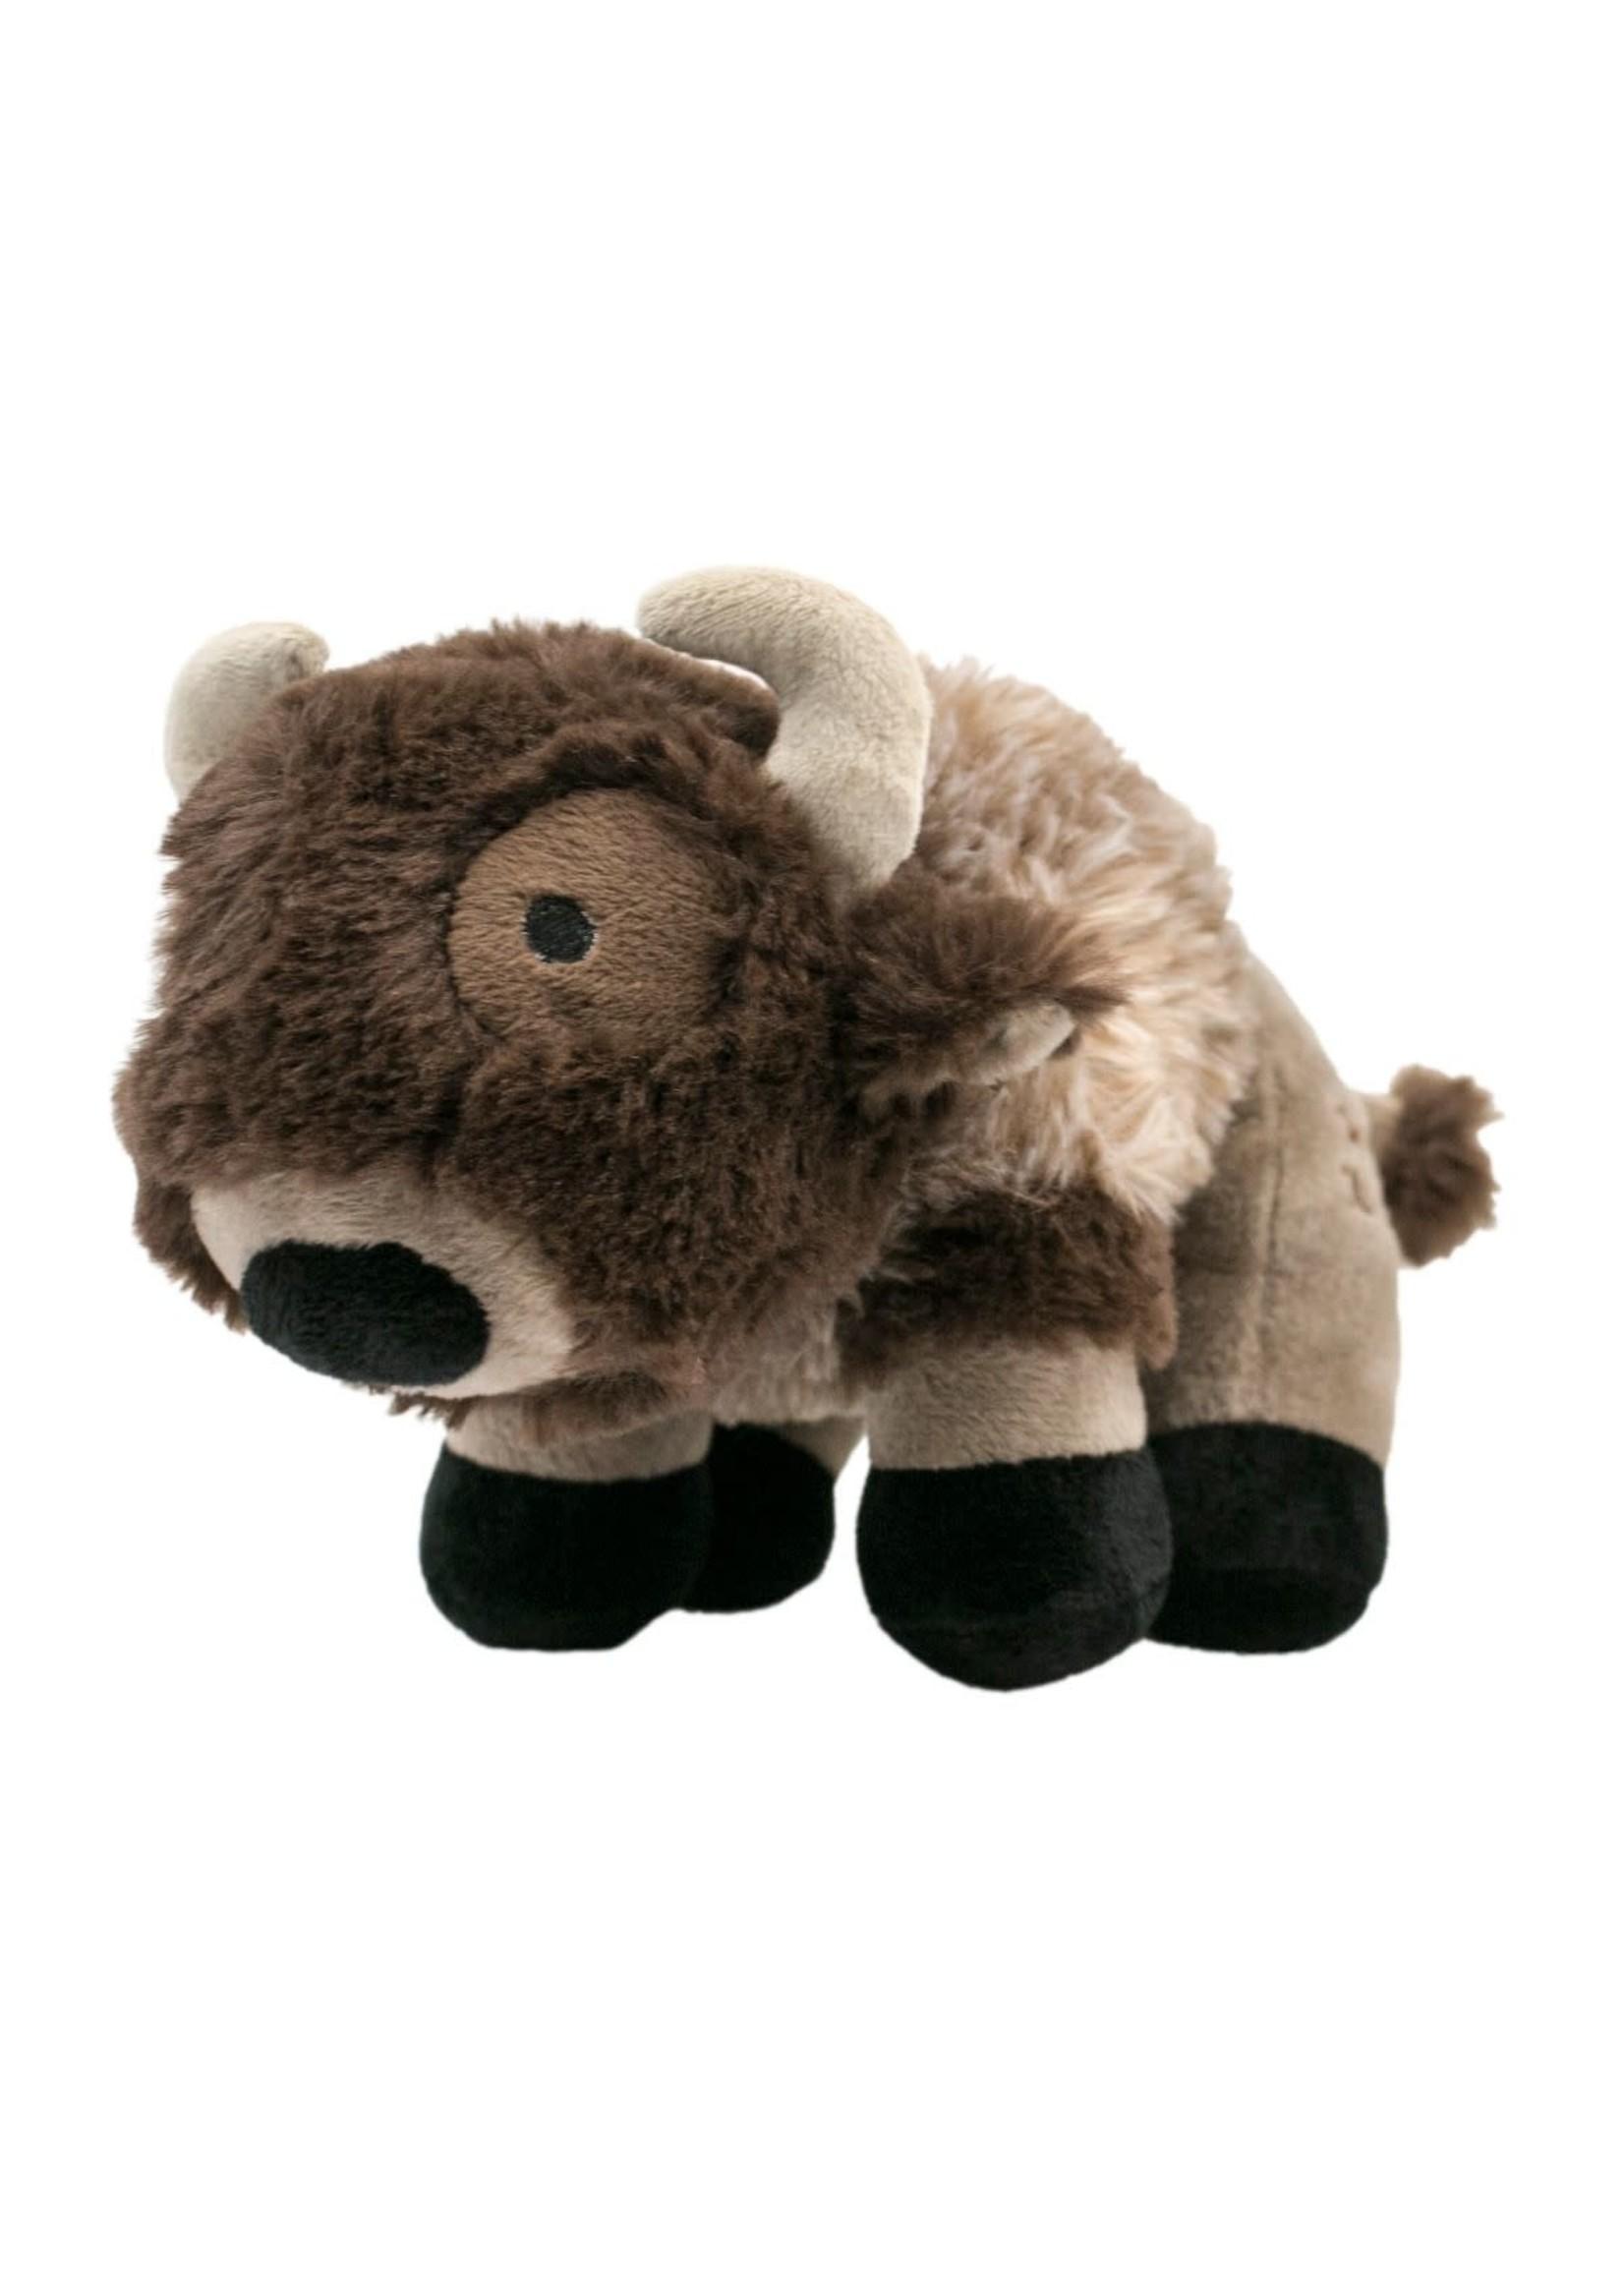 "Tall Tails Tall Tails Plush Buffalo 9"""